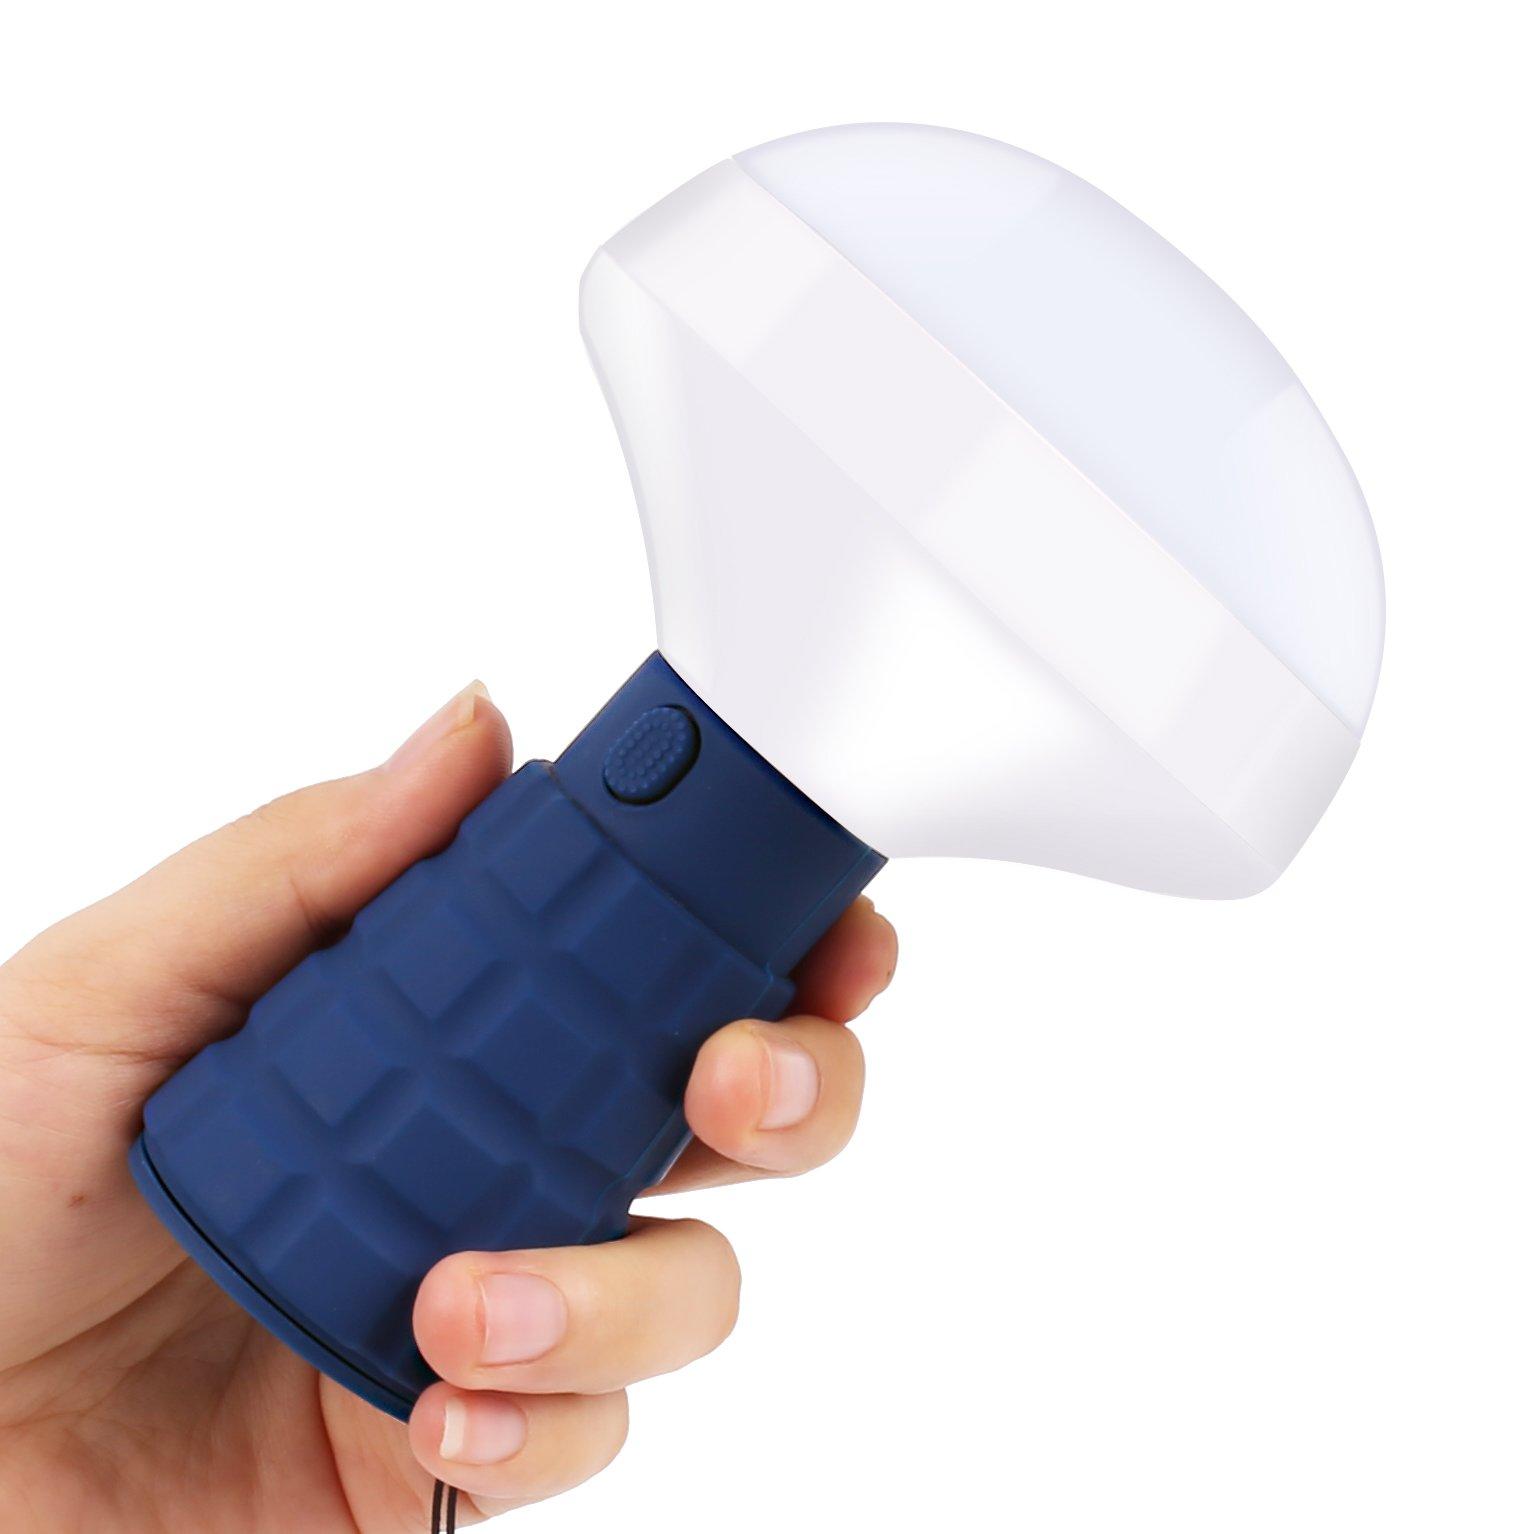 LED Flashlight, Magnetic Energy-Saving Flashlight, Ultra Bright Portable LED Lamp SOS Strobe Light, Children's Room, Camping, Hiking, Biking